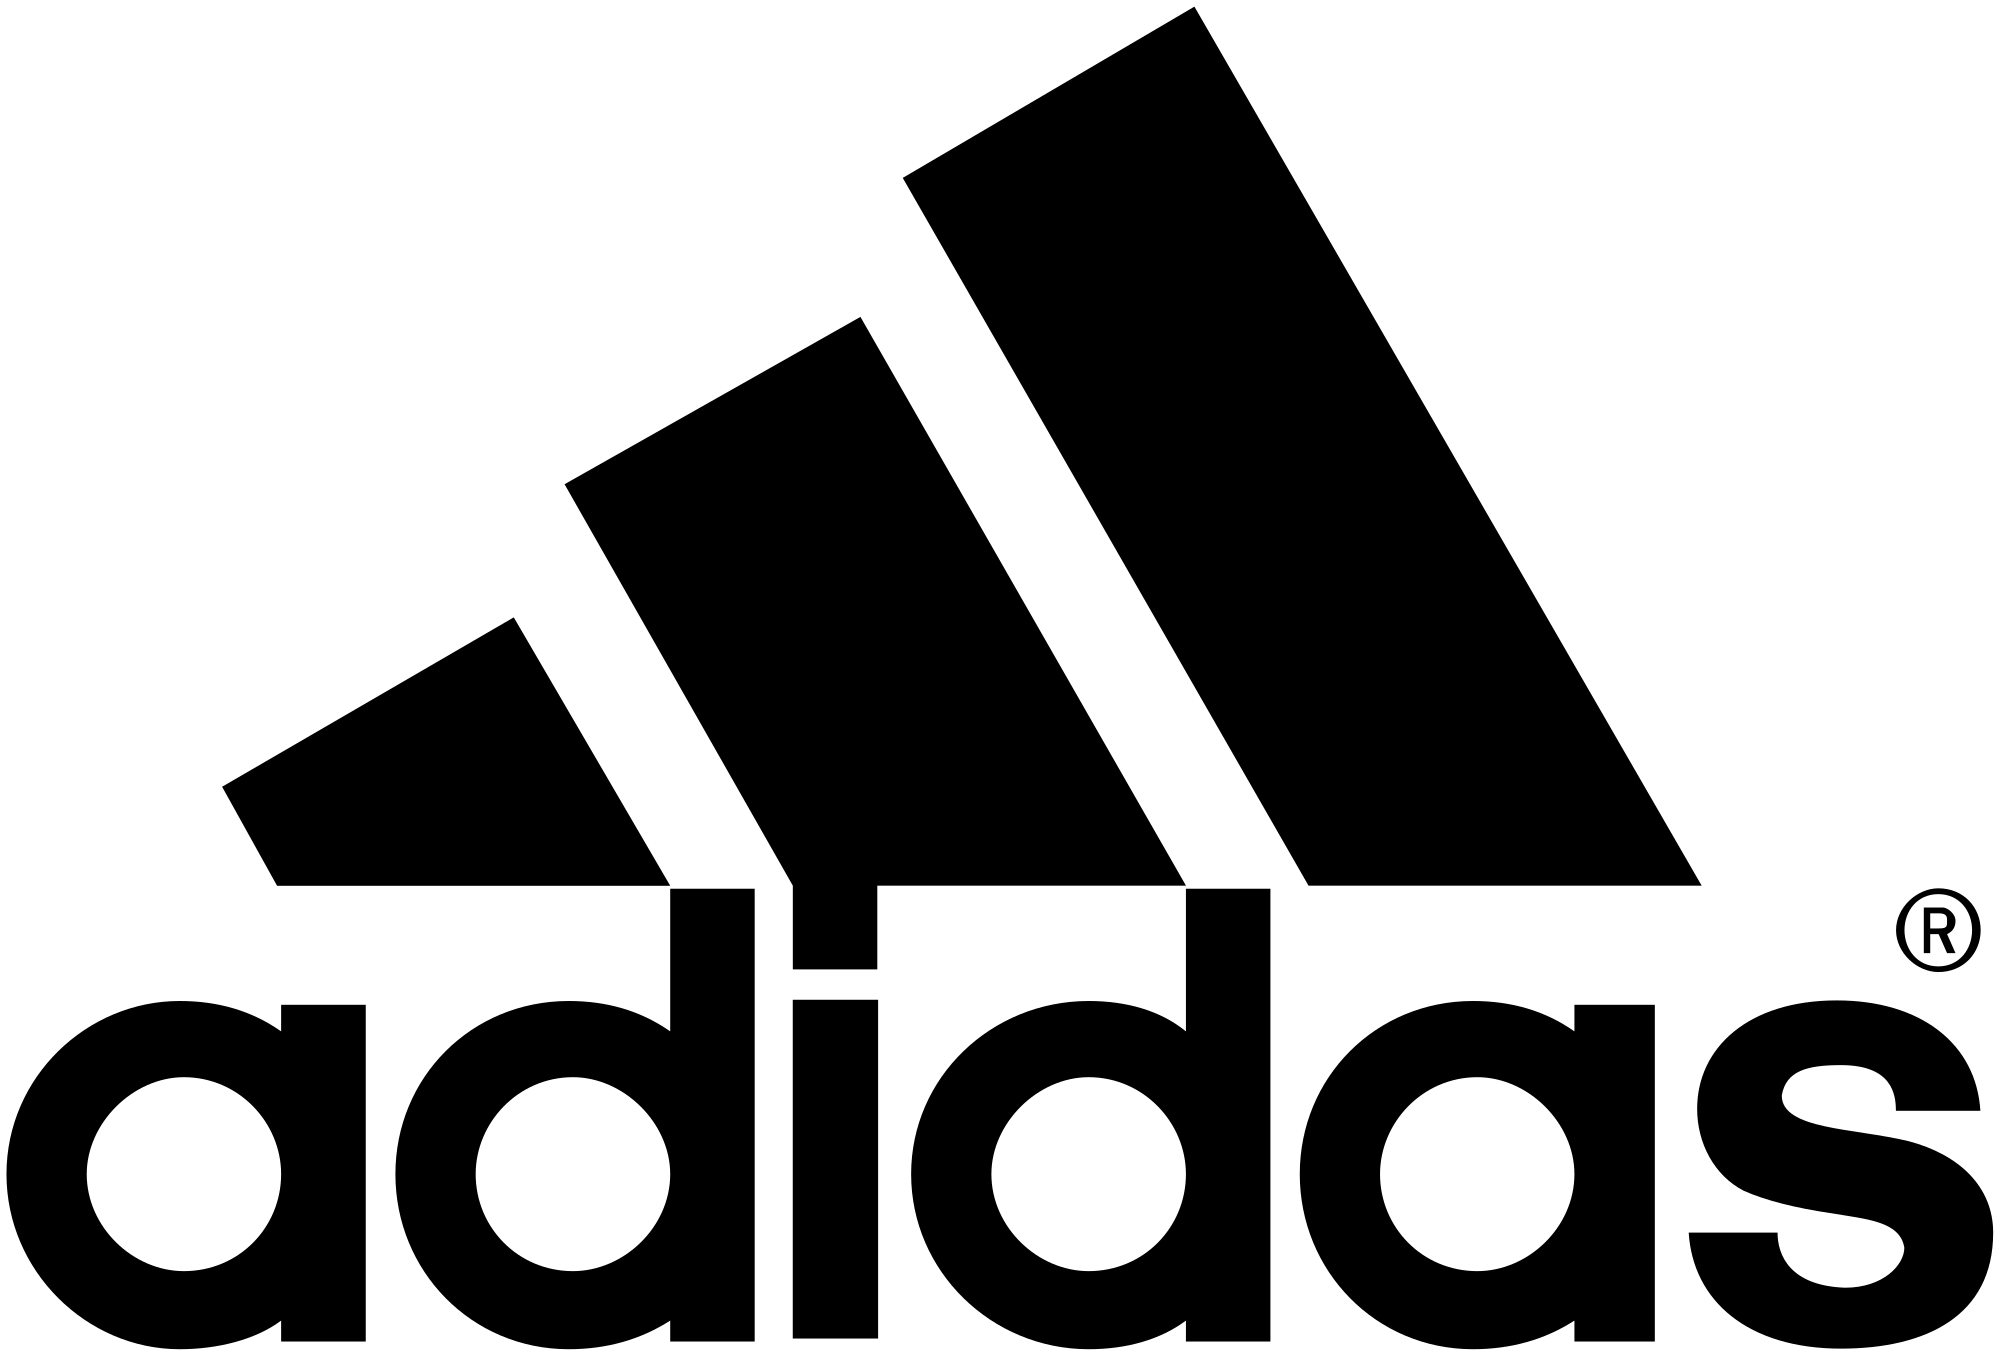 Adidas Iconic Fashion Logos